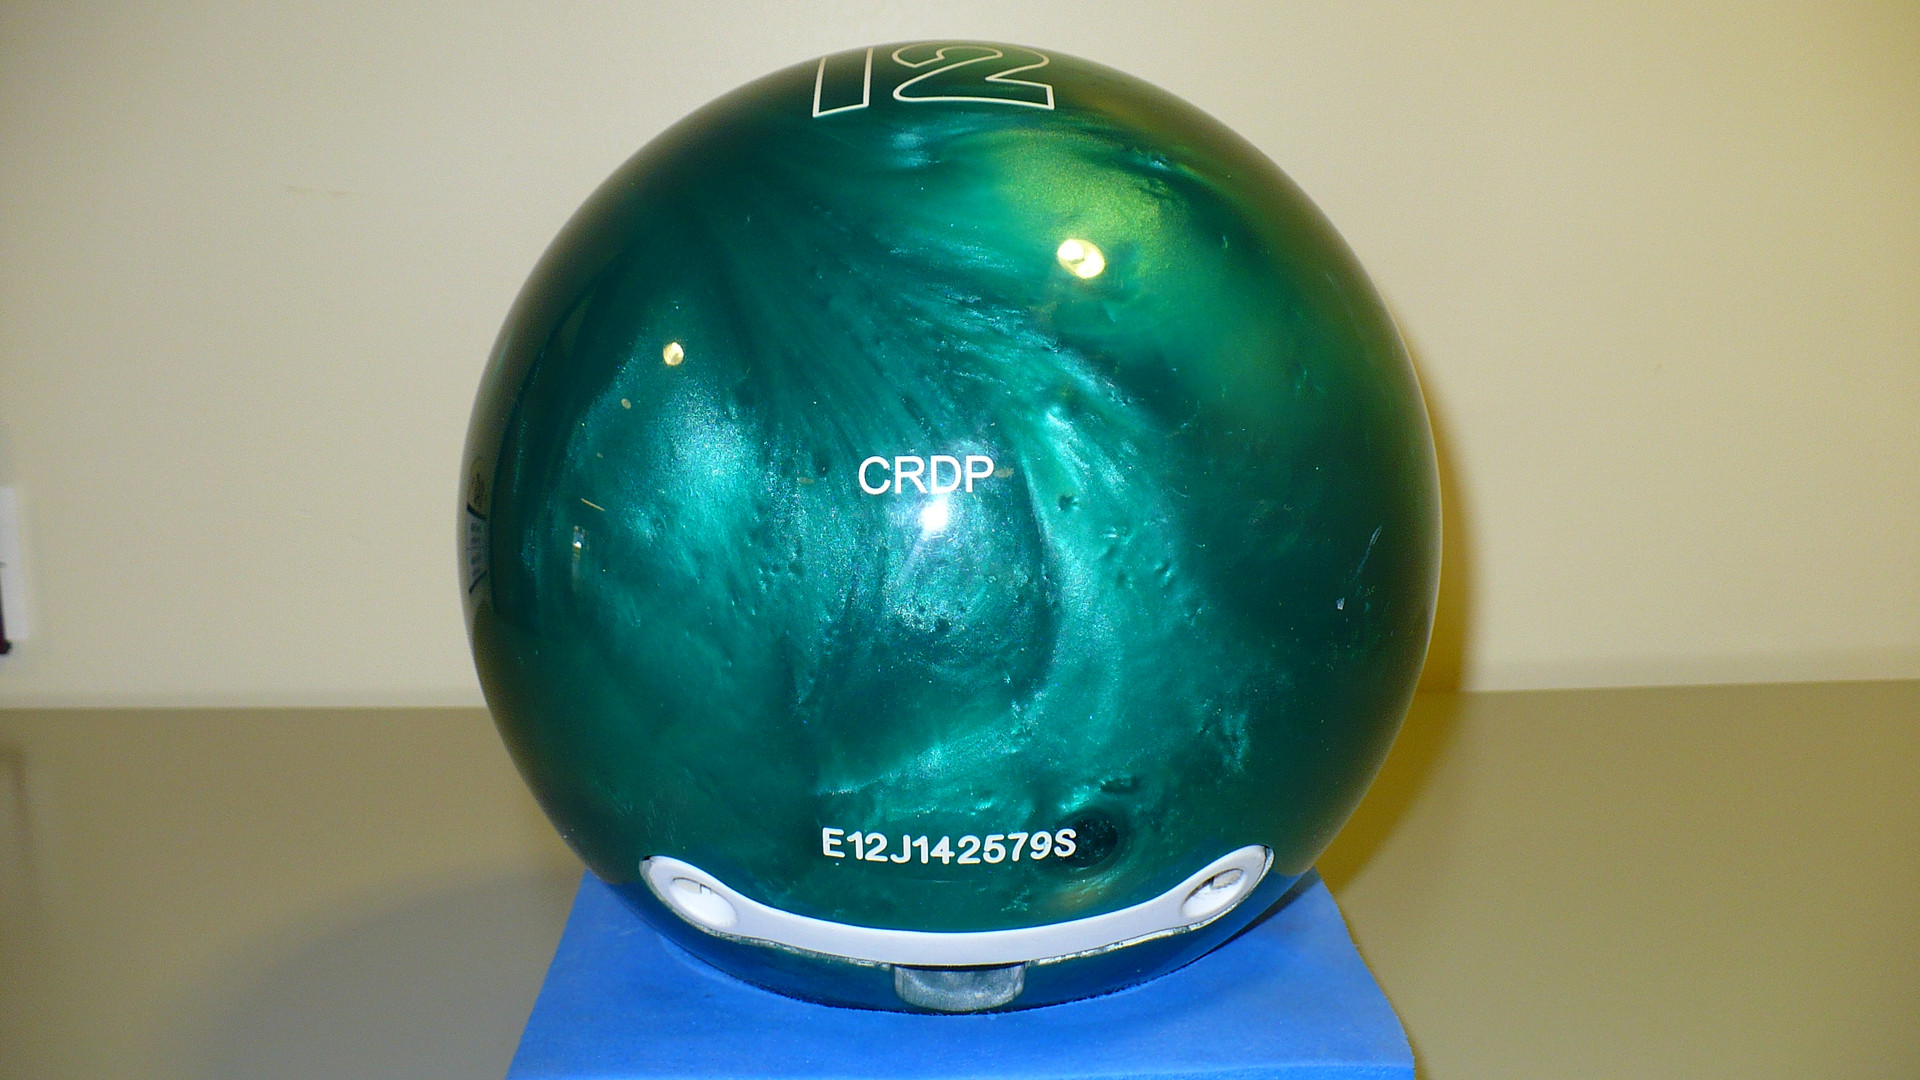 032 Boule de quille.JPG